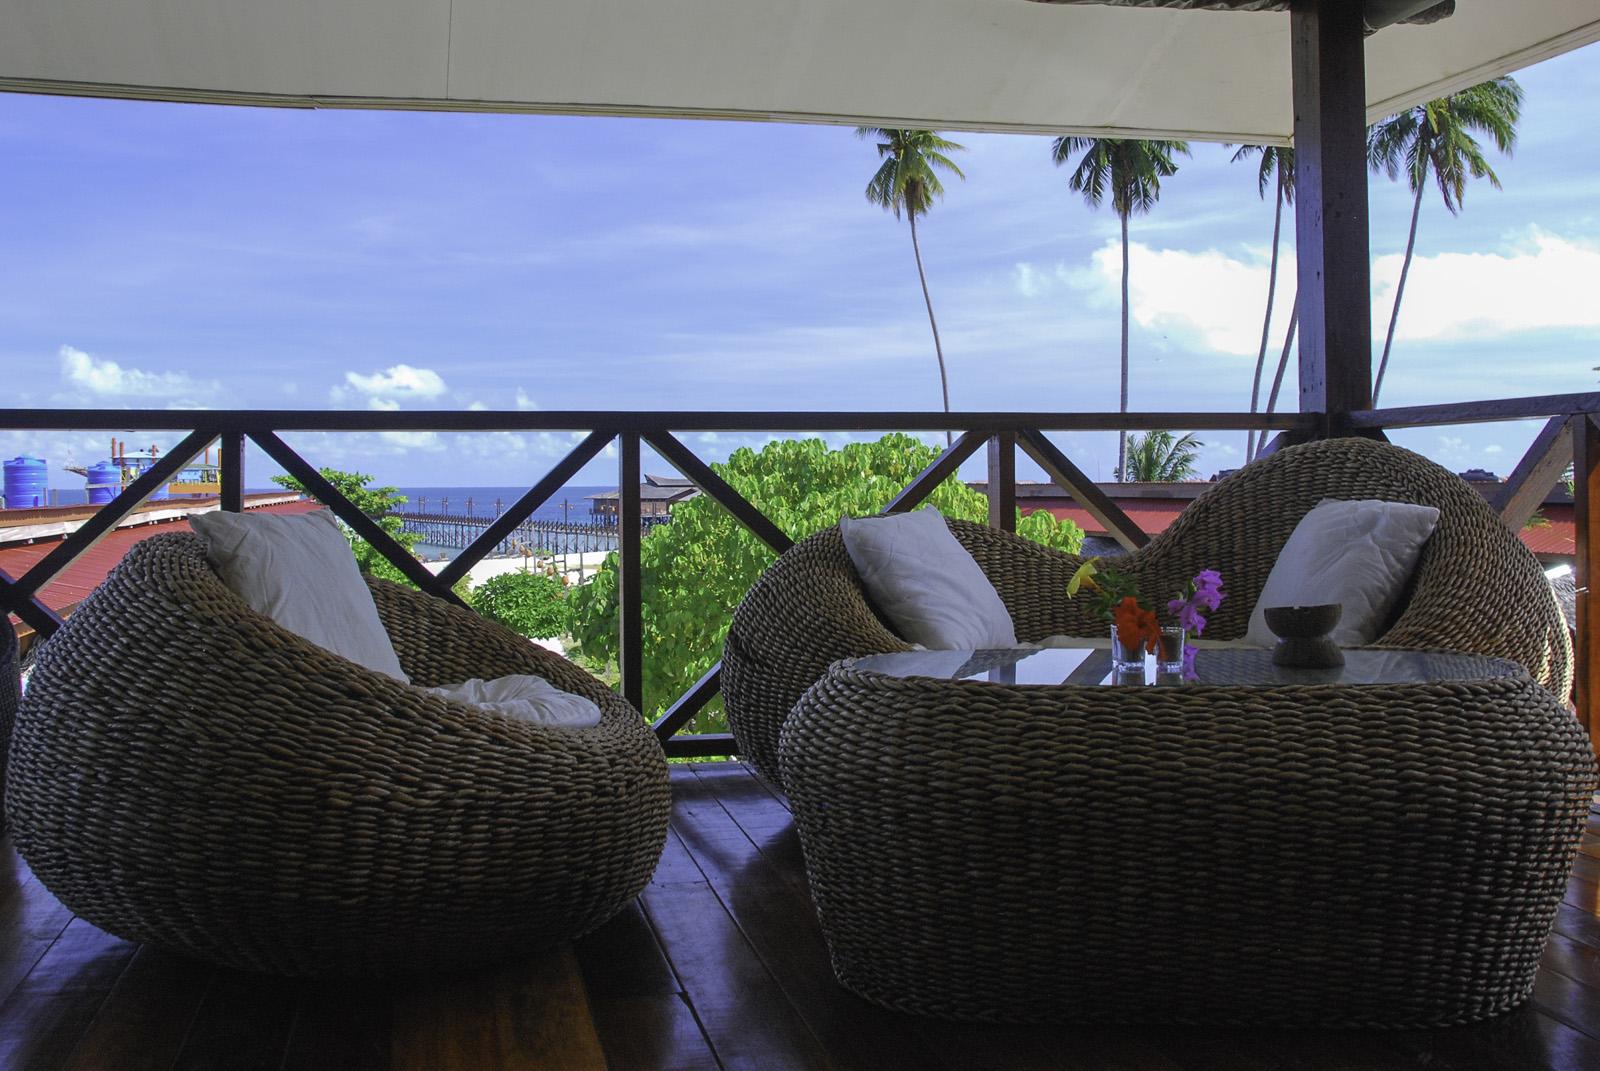 a-view-from-the-2nd-story-bar-at-scuba-junkie-mabul-beach-resort-mabul-island-tino-hermann.jpg